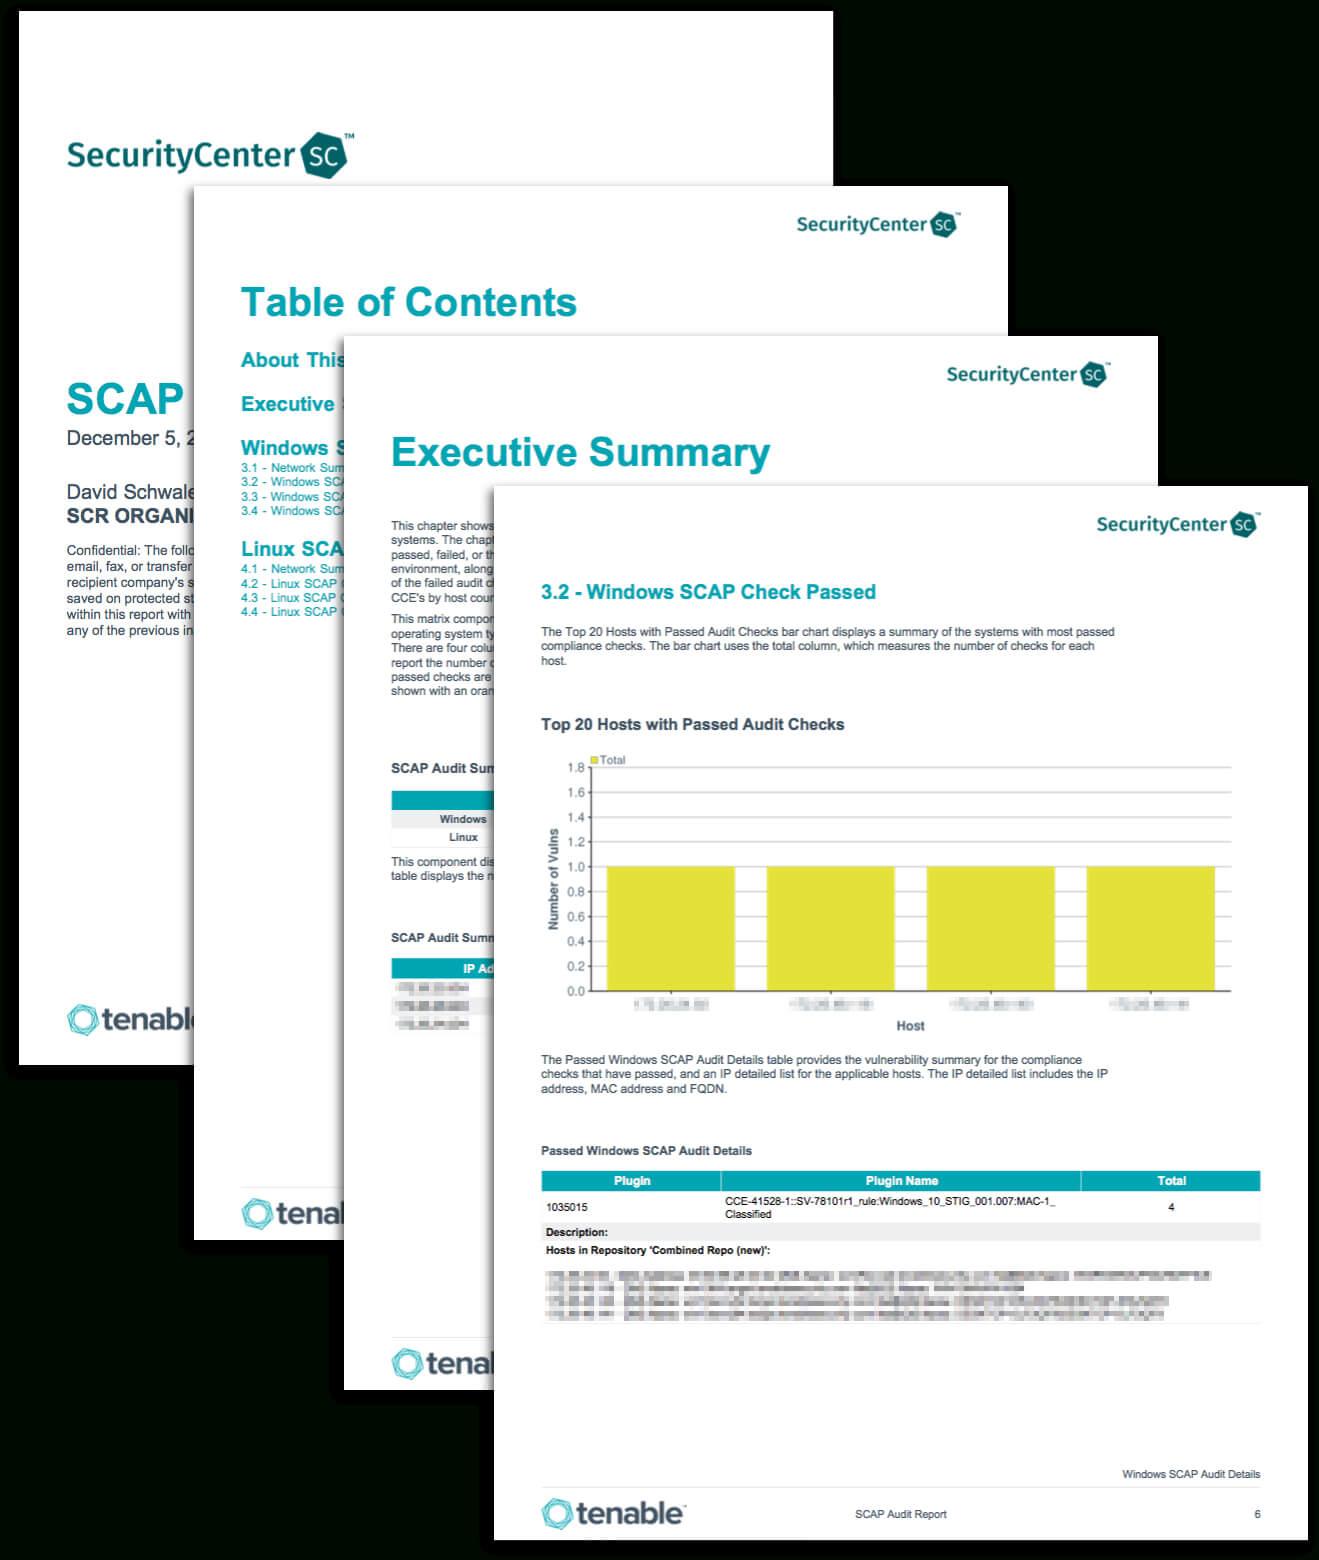 Scap Audit Report - Sc Report Template | Tenable® for Security Audit Report Template